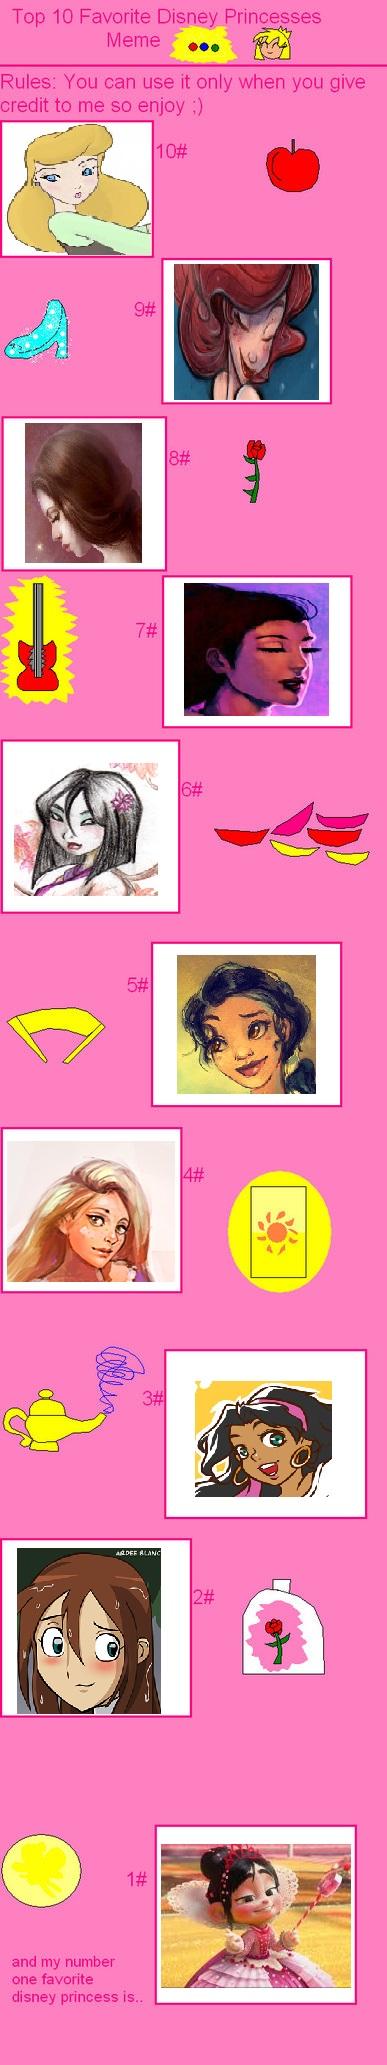 My Top 10 Favorite Disney Princesses by littledoegiuli95